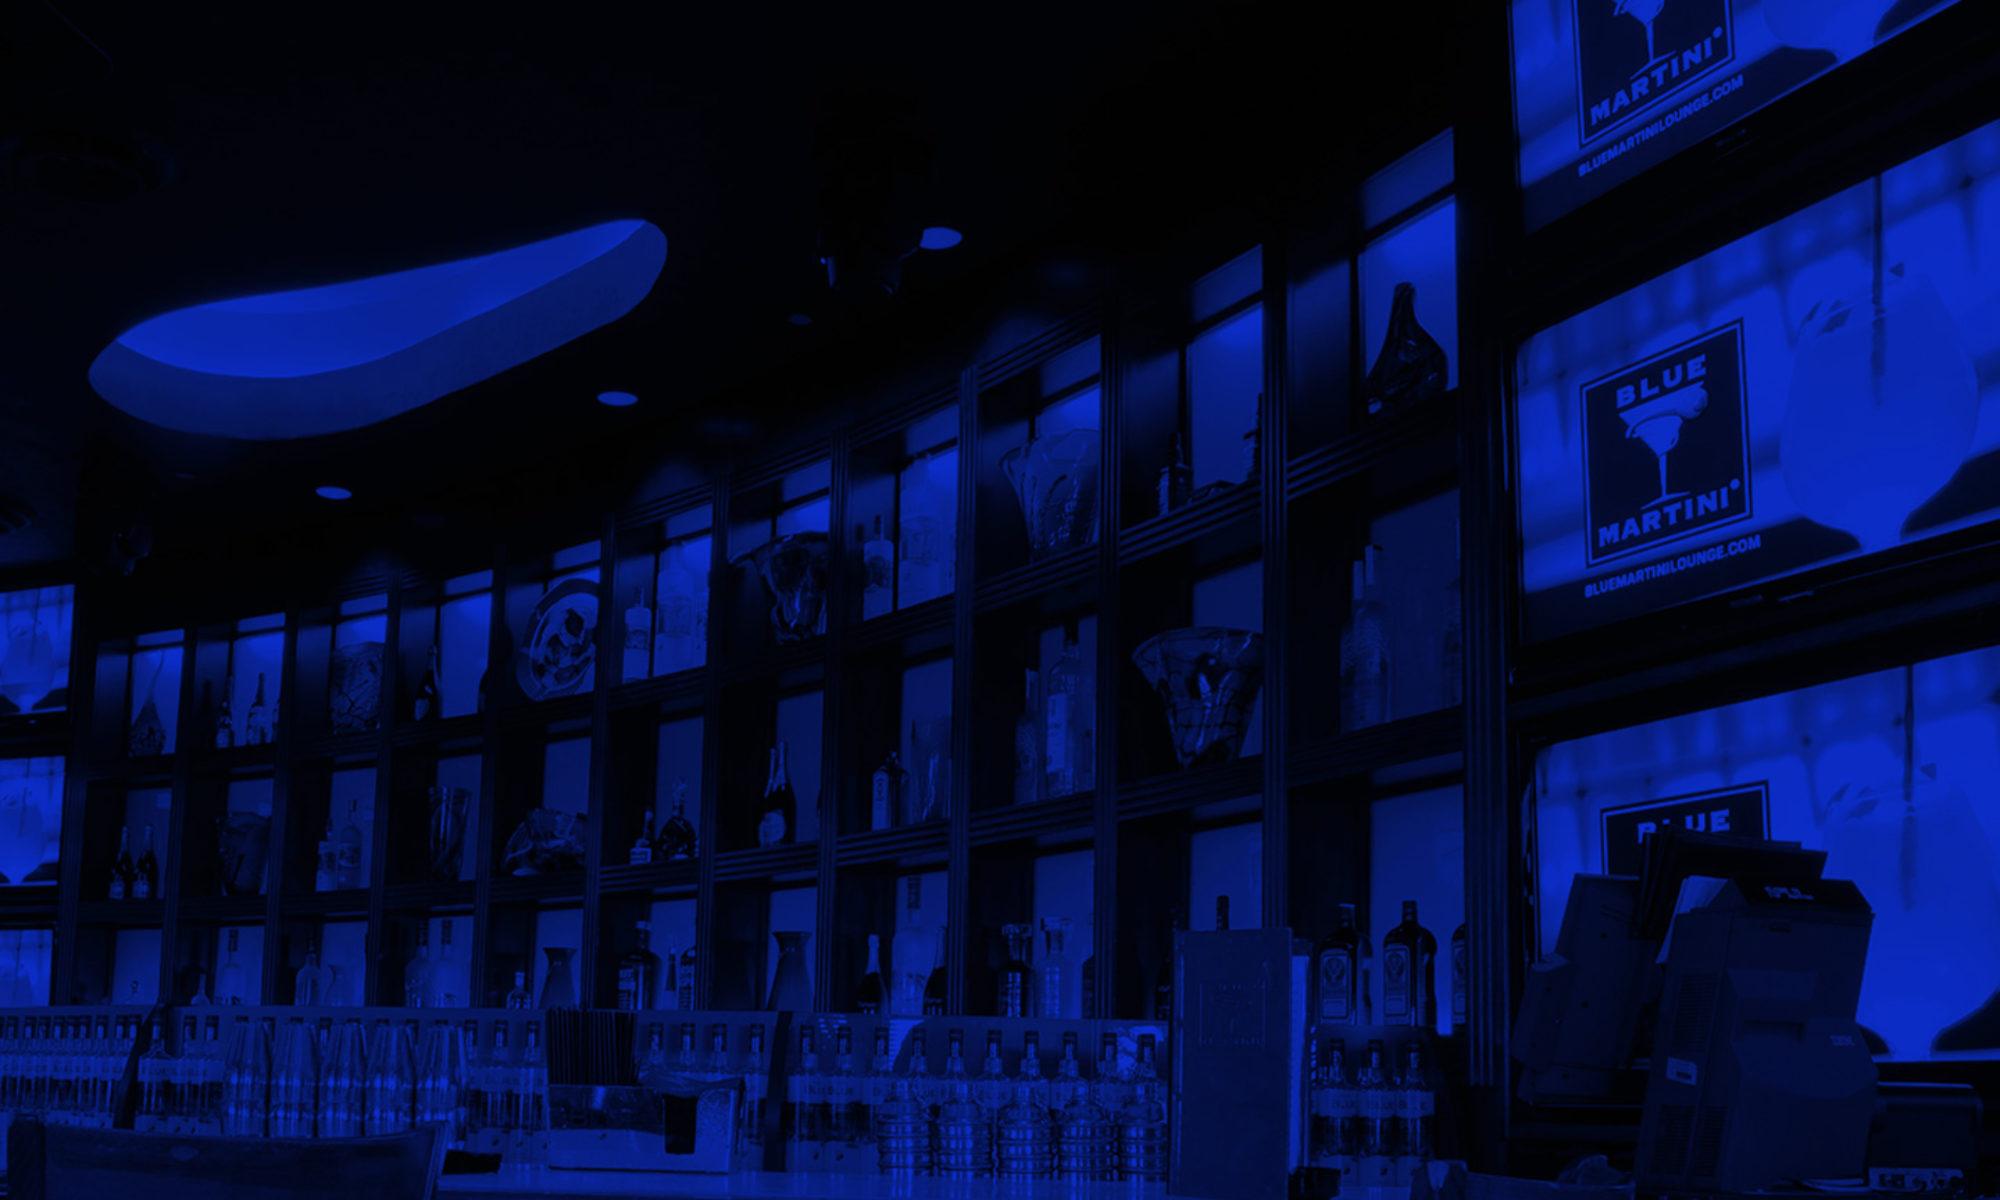 Blue Martini Lounge